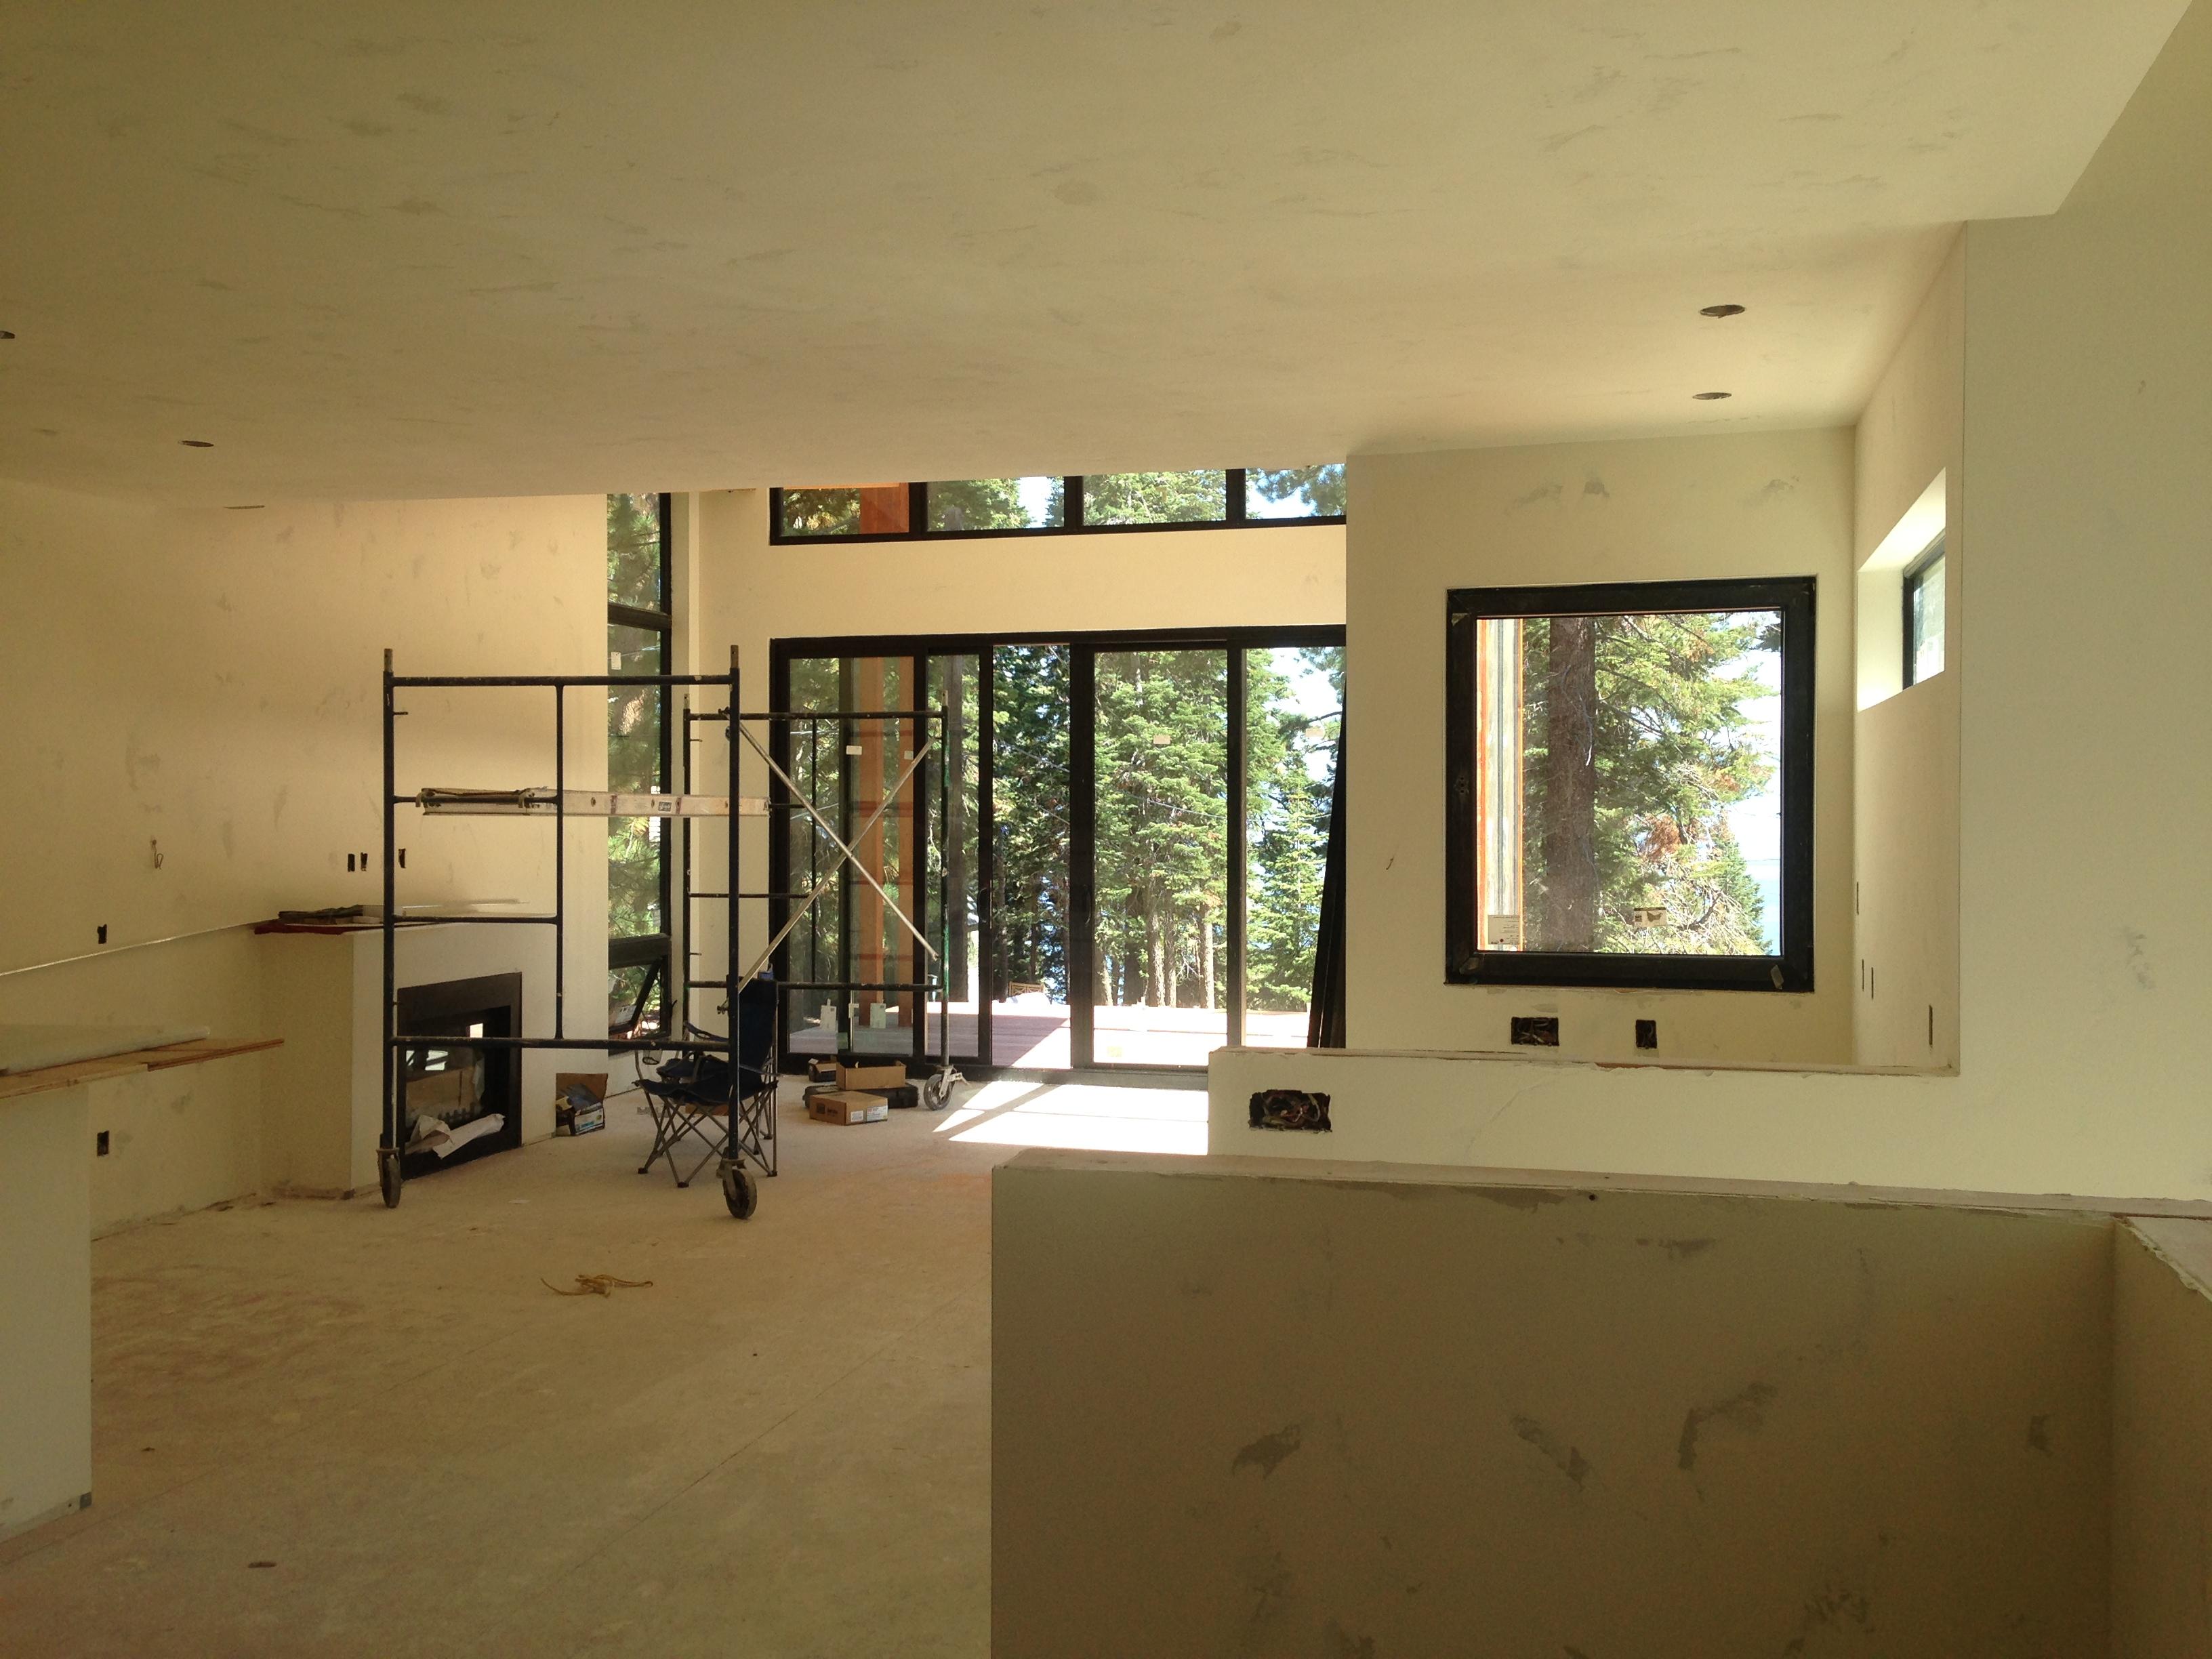 Living Room - Rough Finish